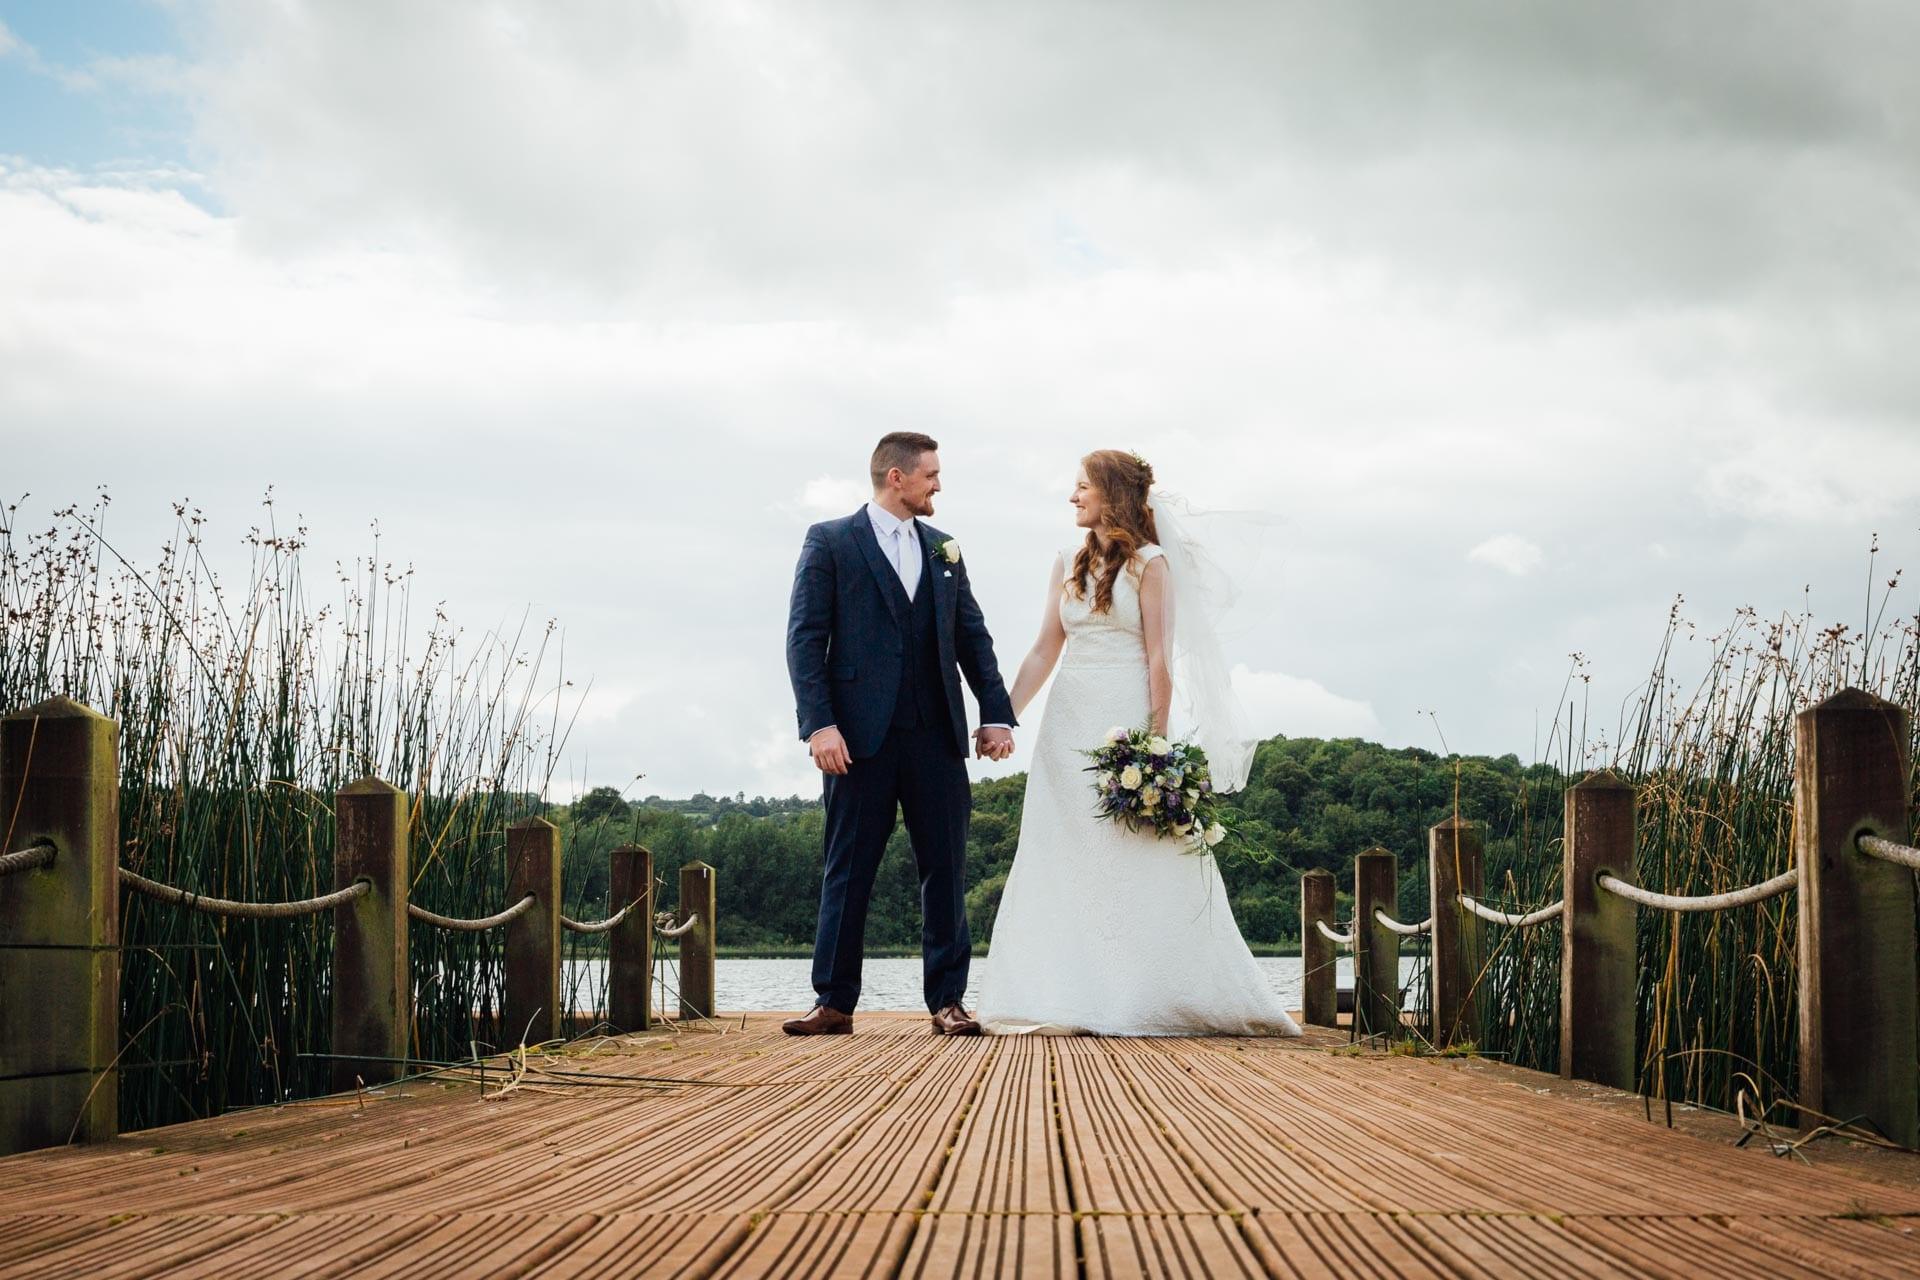 Lough Erne Resort Wedding by Ricky Parker Photography 1 2